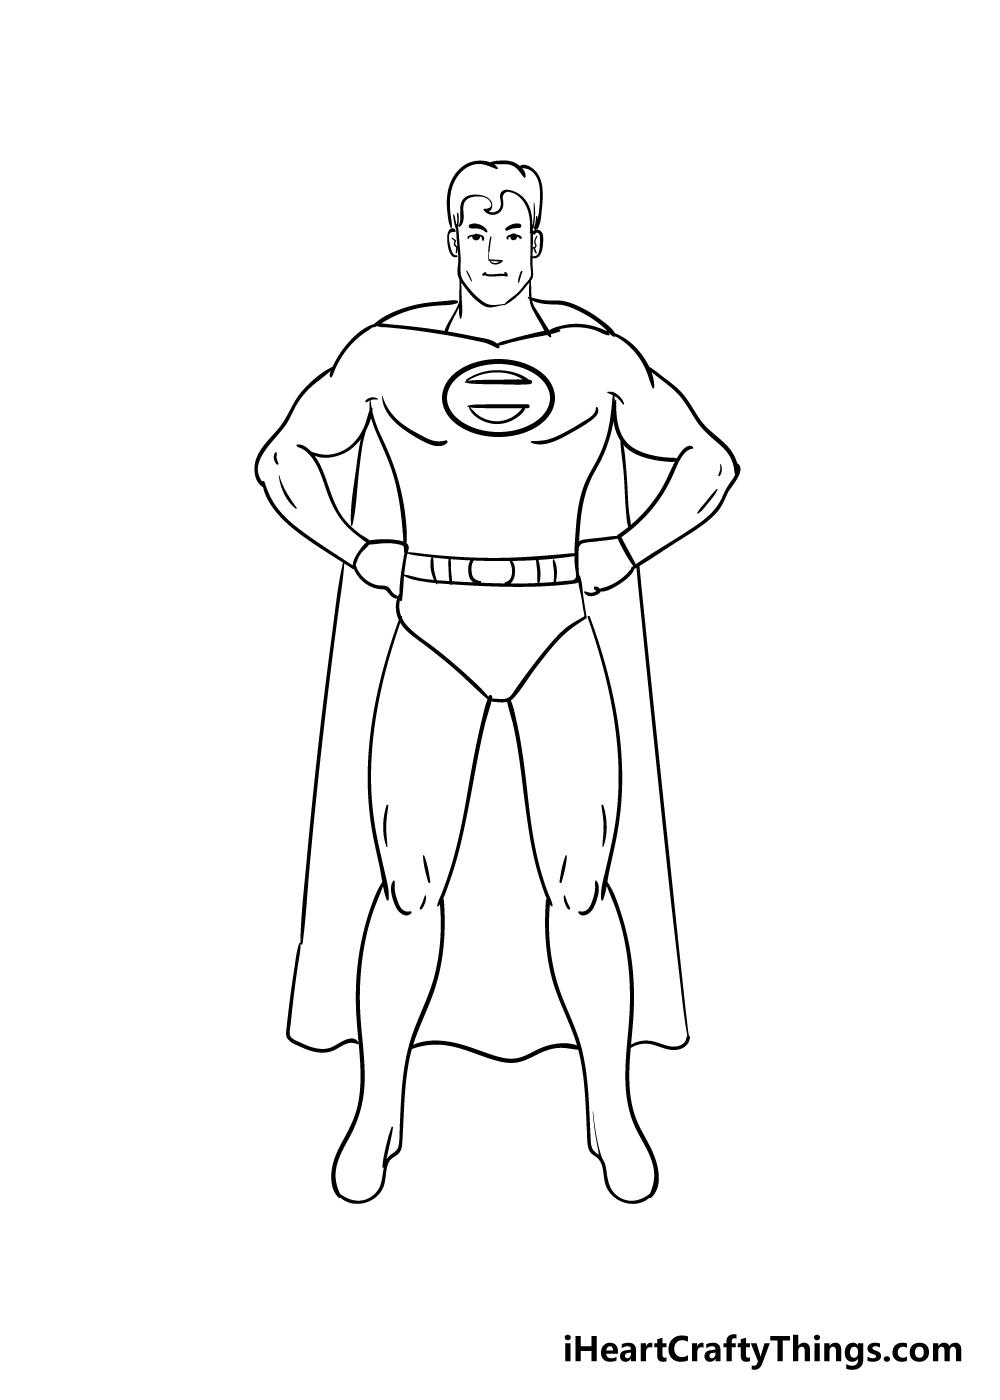 superhero drawing step 6